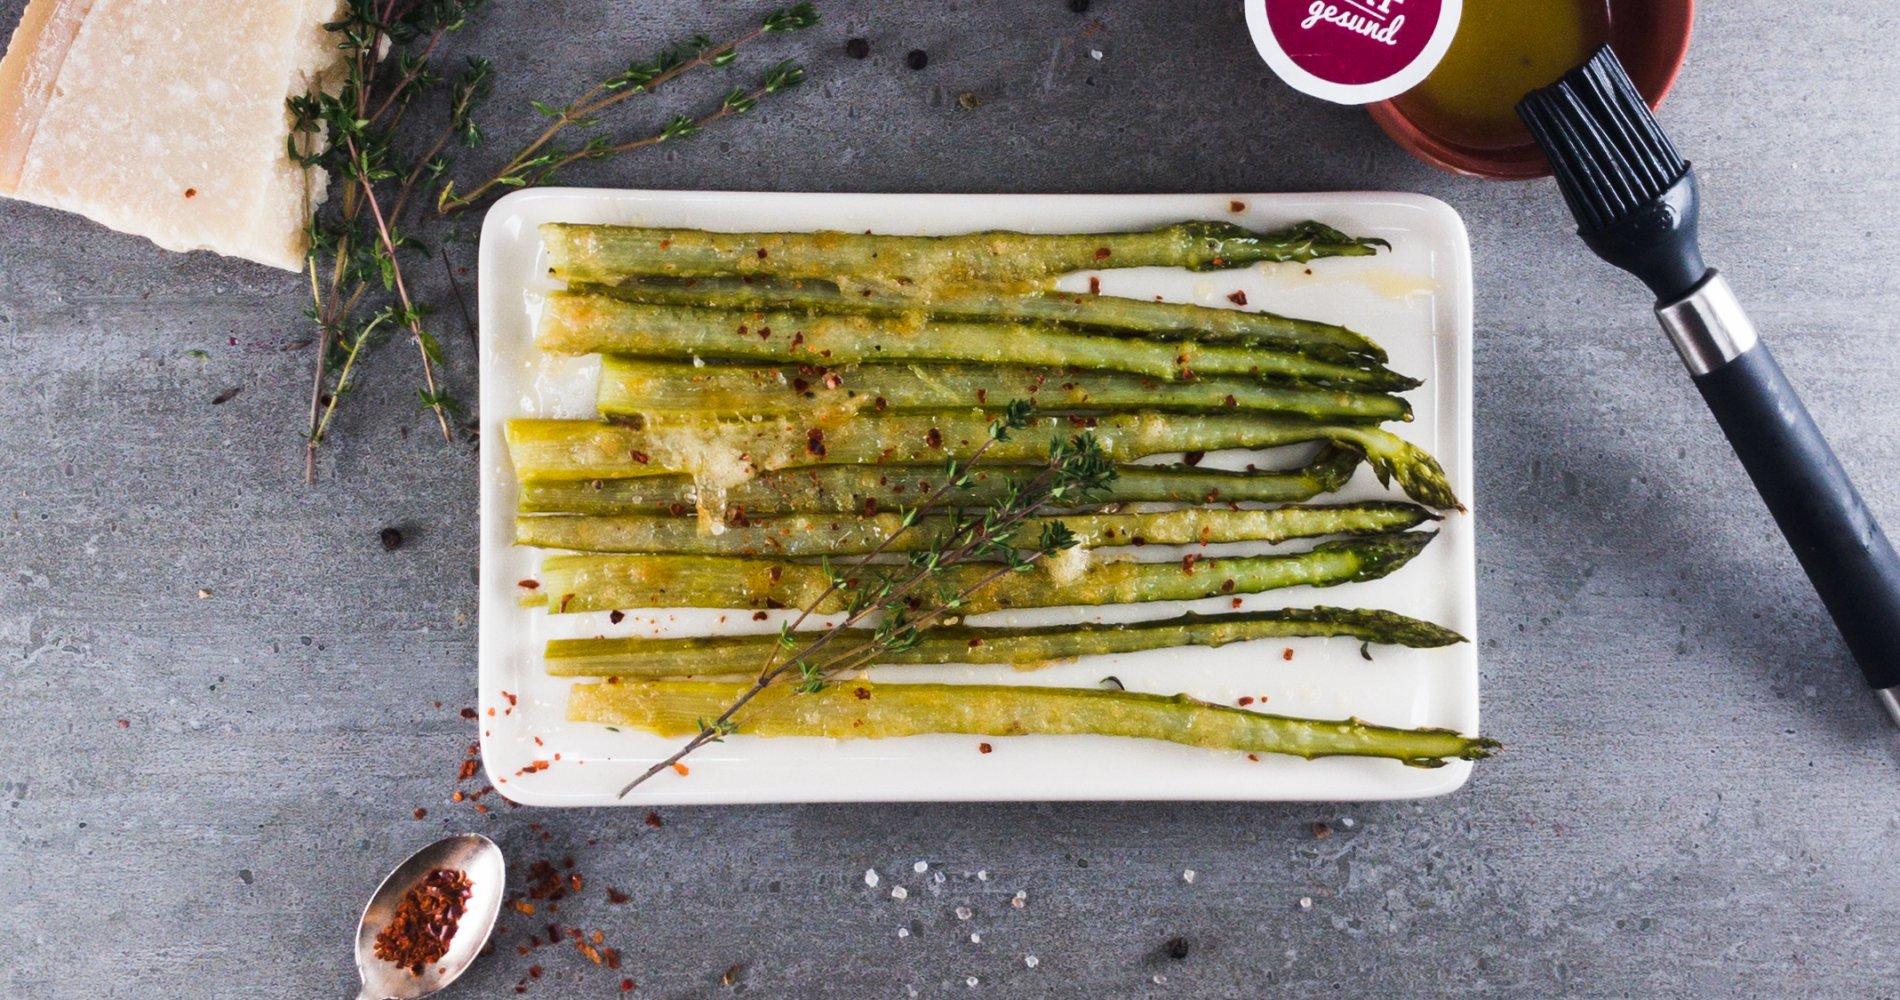 Rezept Low Carb: Grüner Spargel aus dem Ofen - LCHF-gesund.de